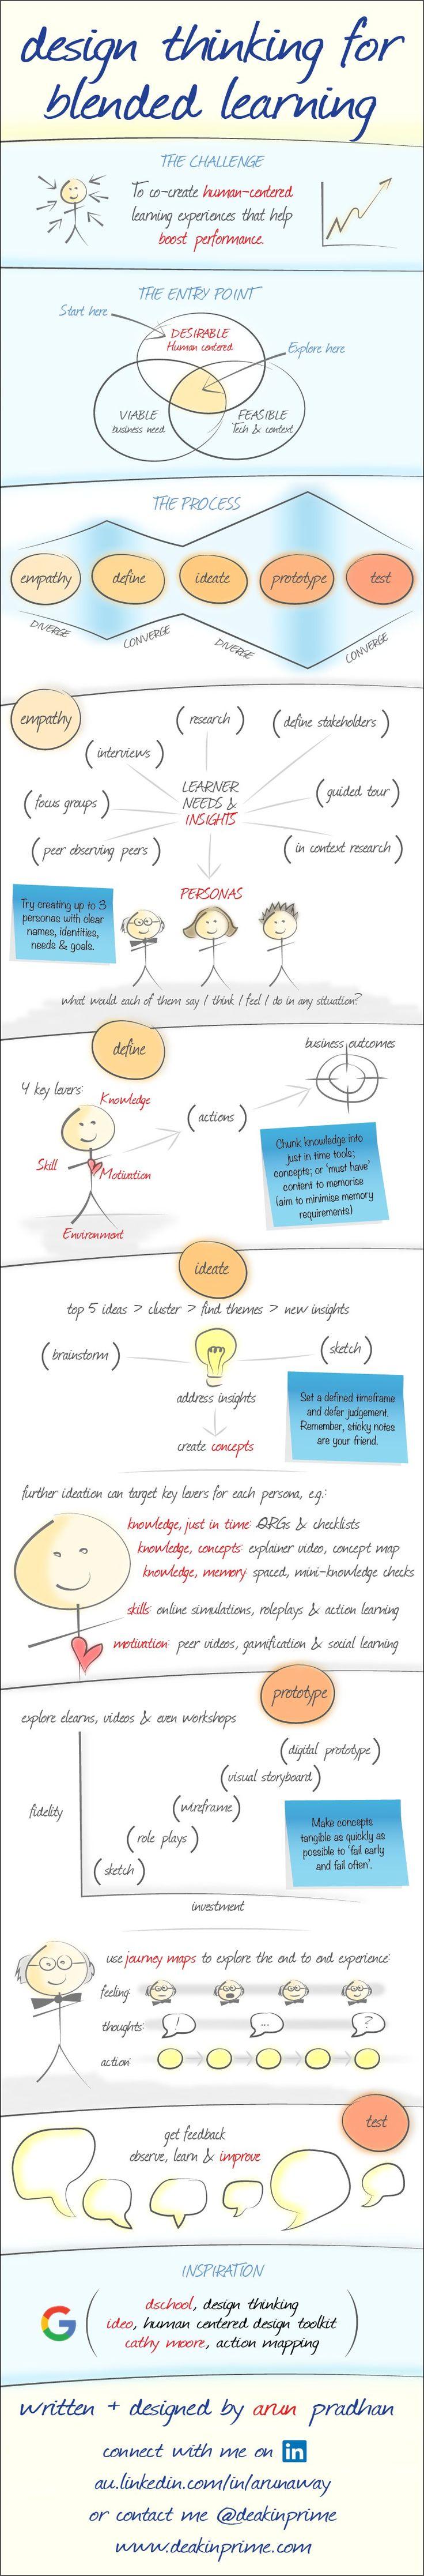 Design Thinking For Blended Learning